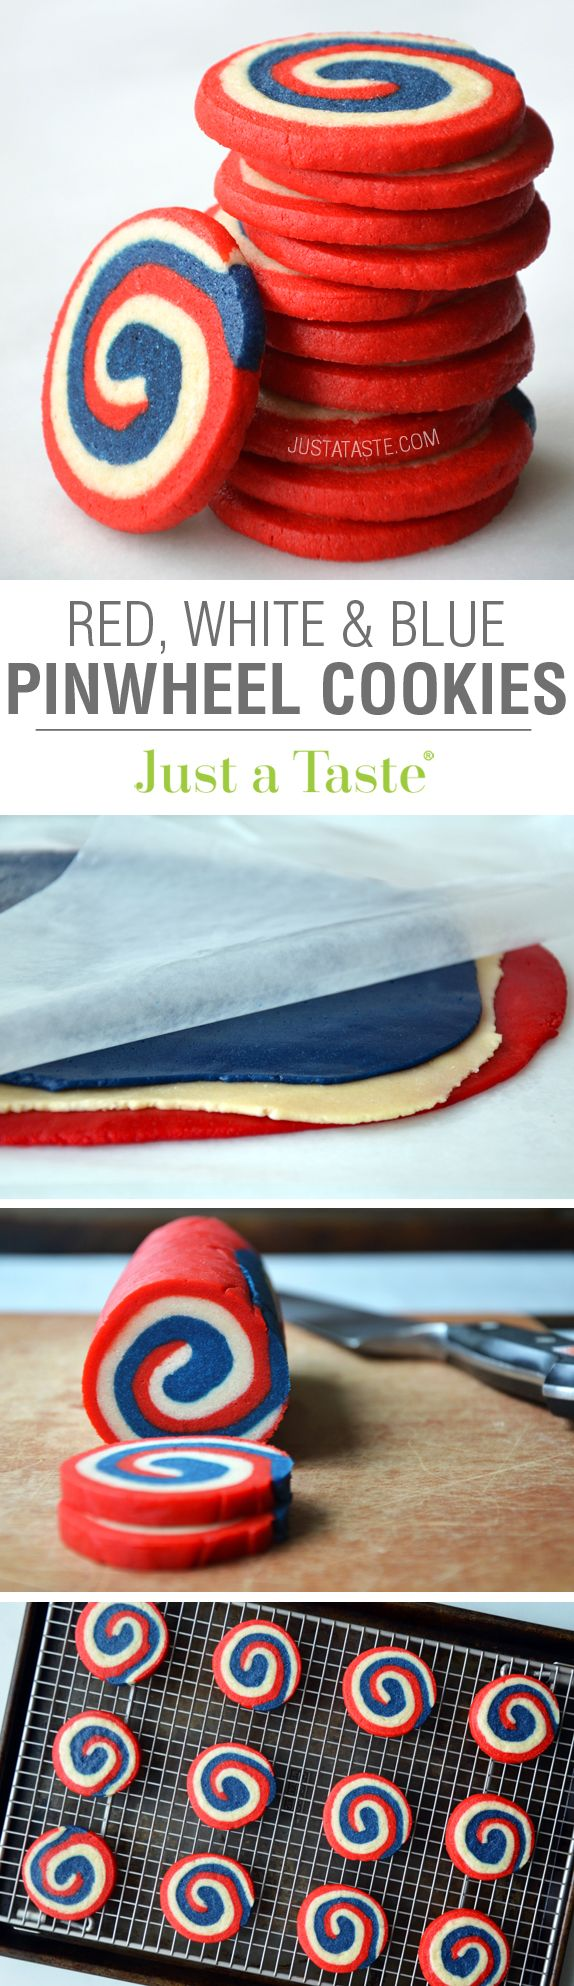 Red, White & Blue Pinwheel Icebox Cookies #recipe on justataste.com